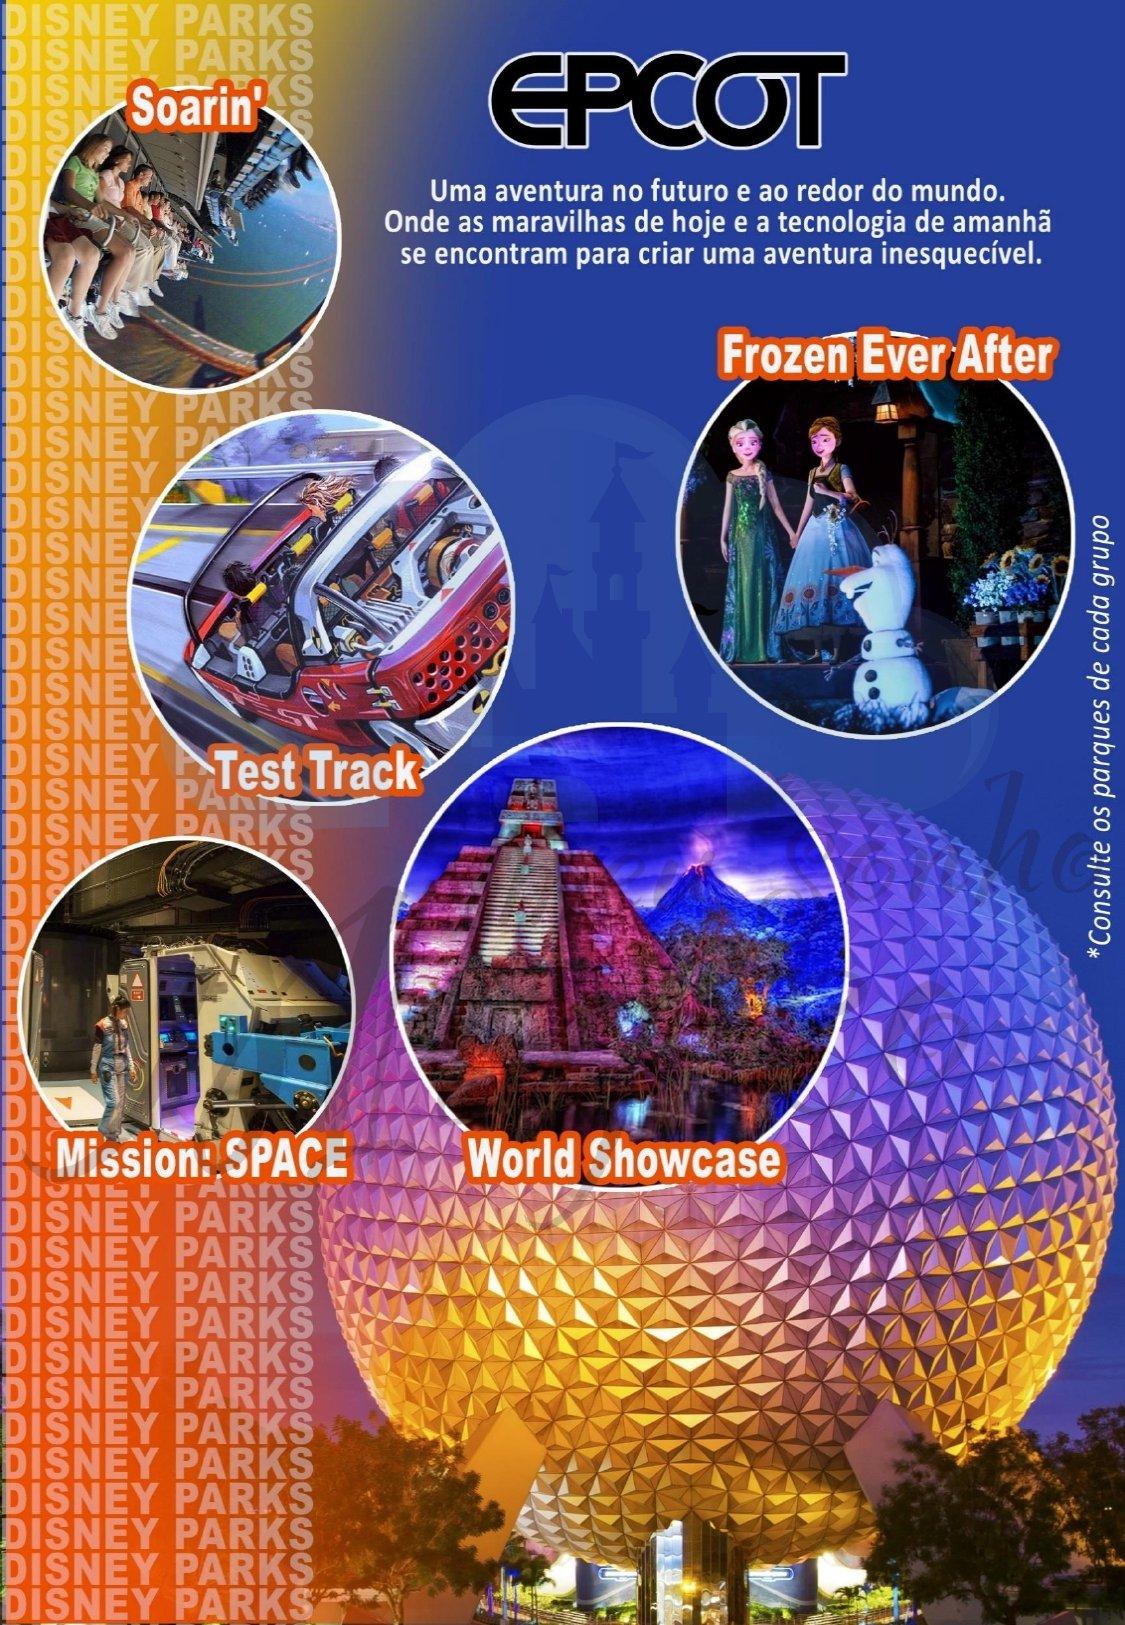 Grupo Teen Inverno - Disney Janeiro 2022 9